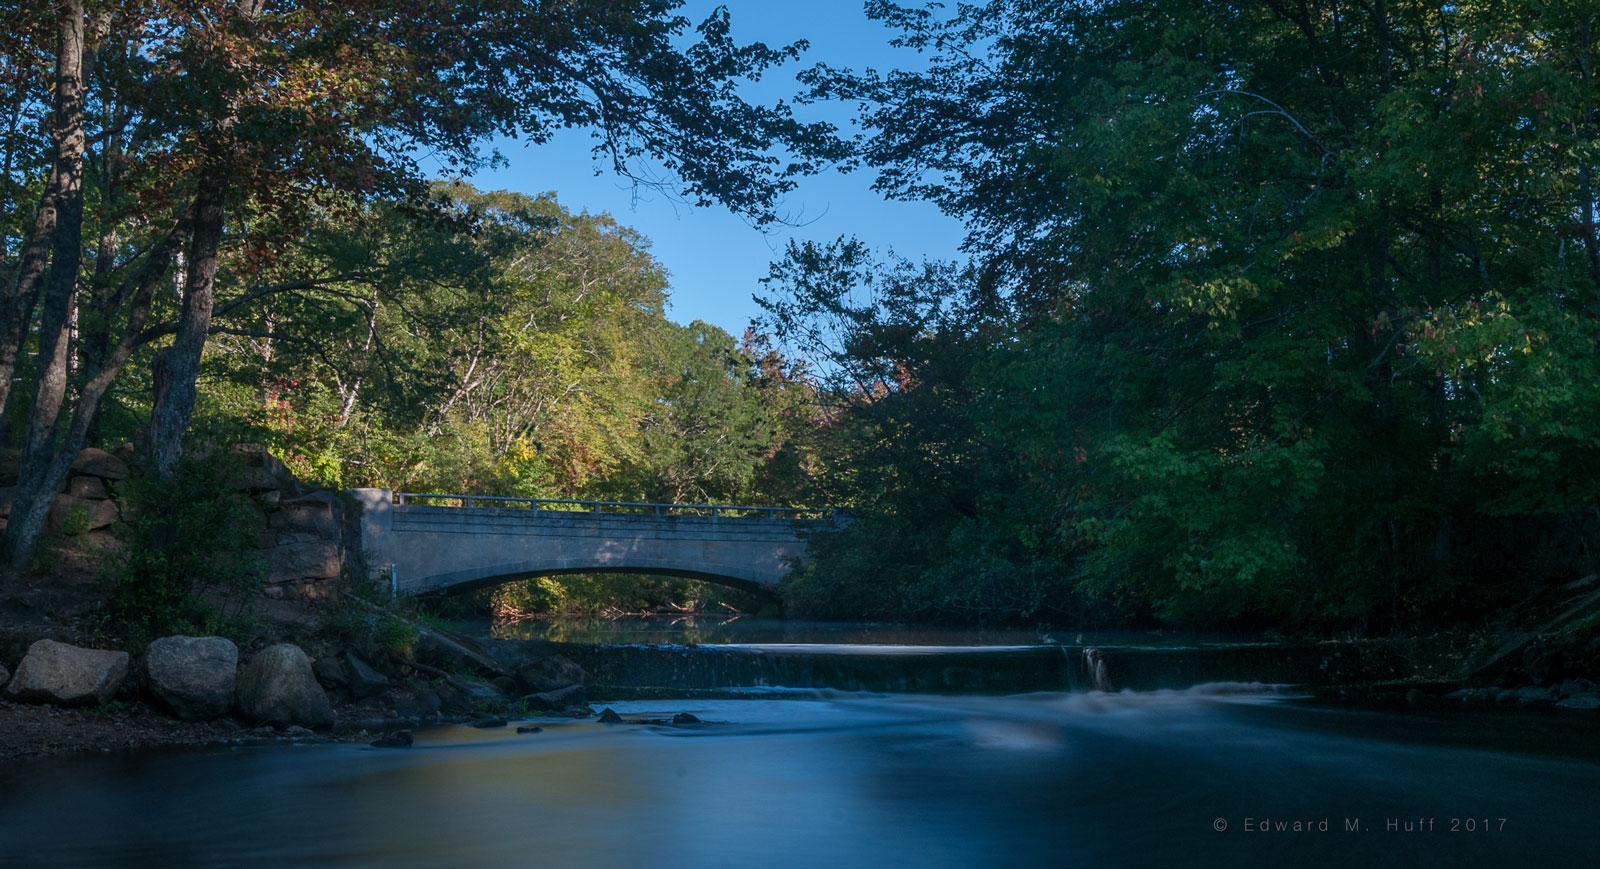 Cronan Access on the Wood River, Carolina, RI